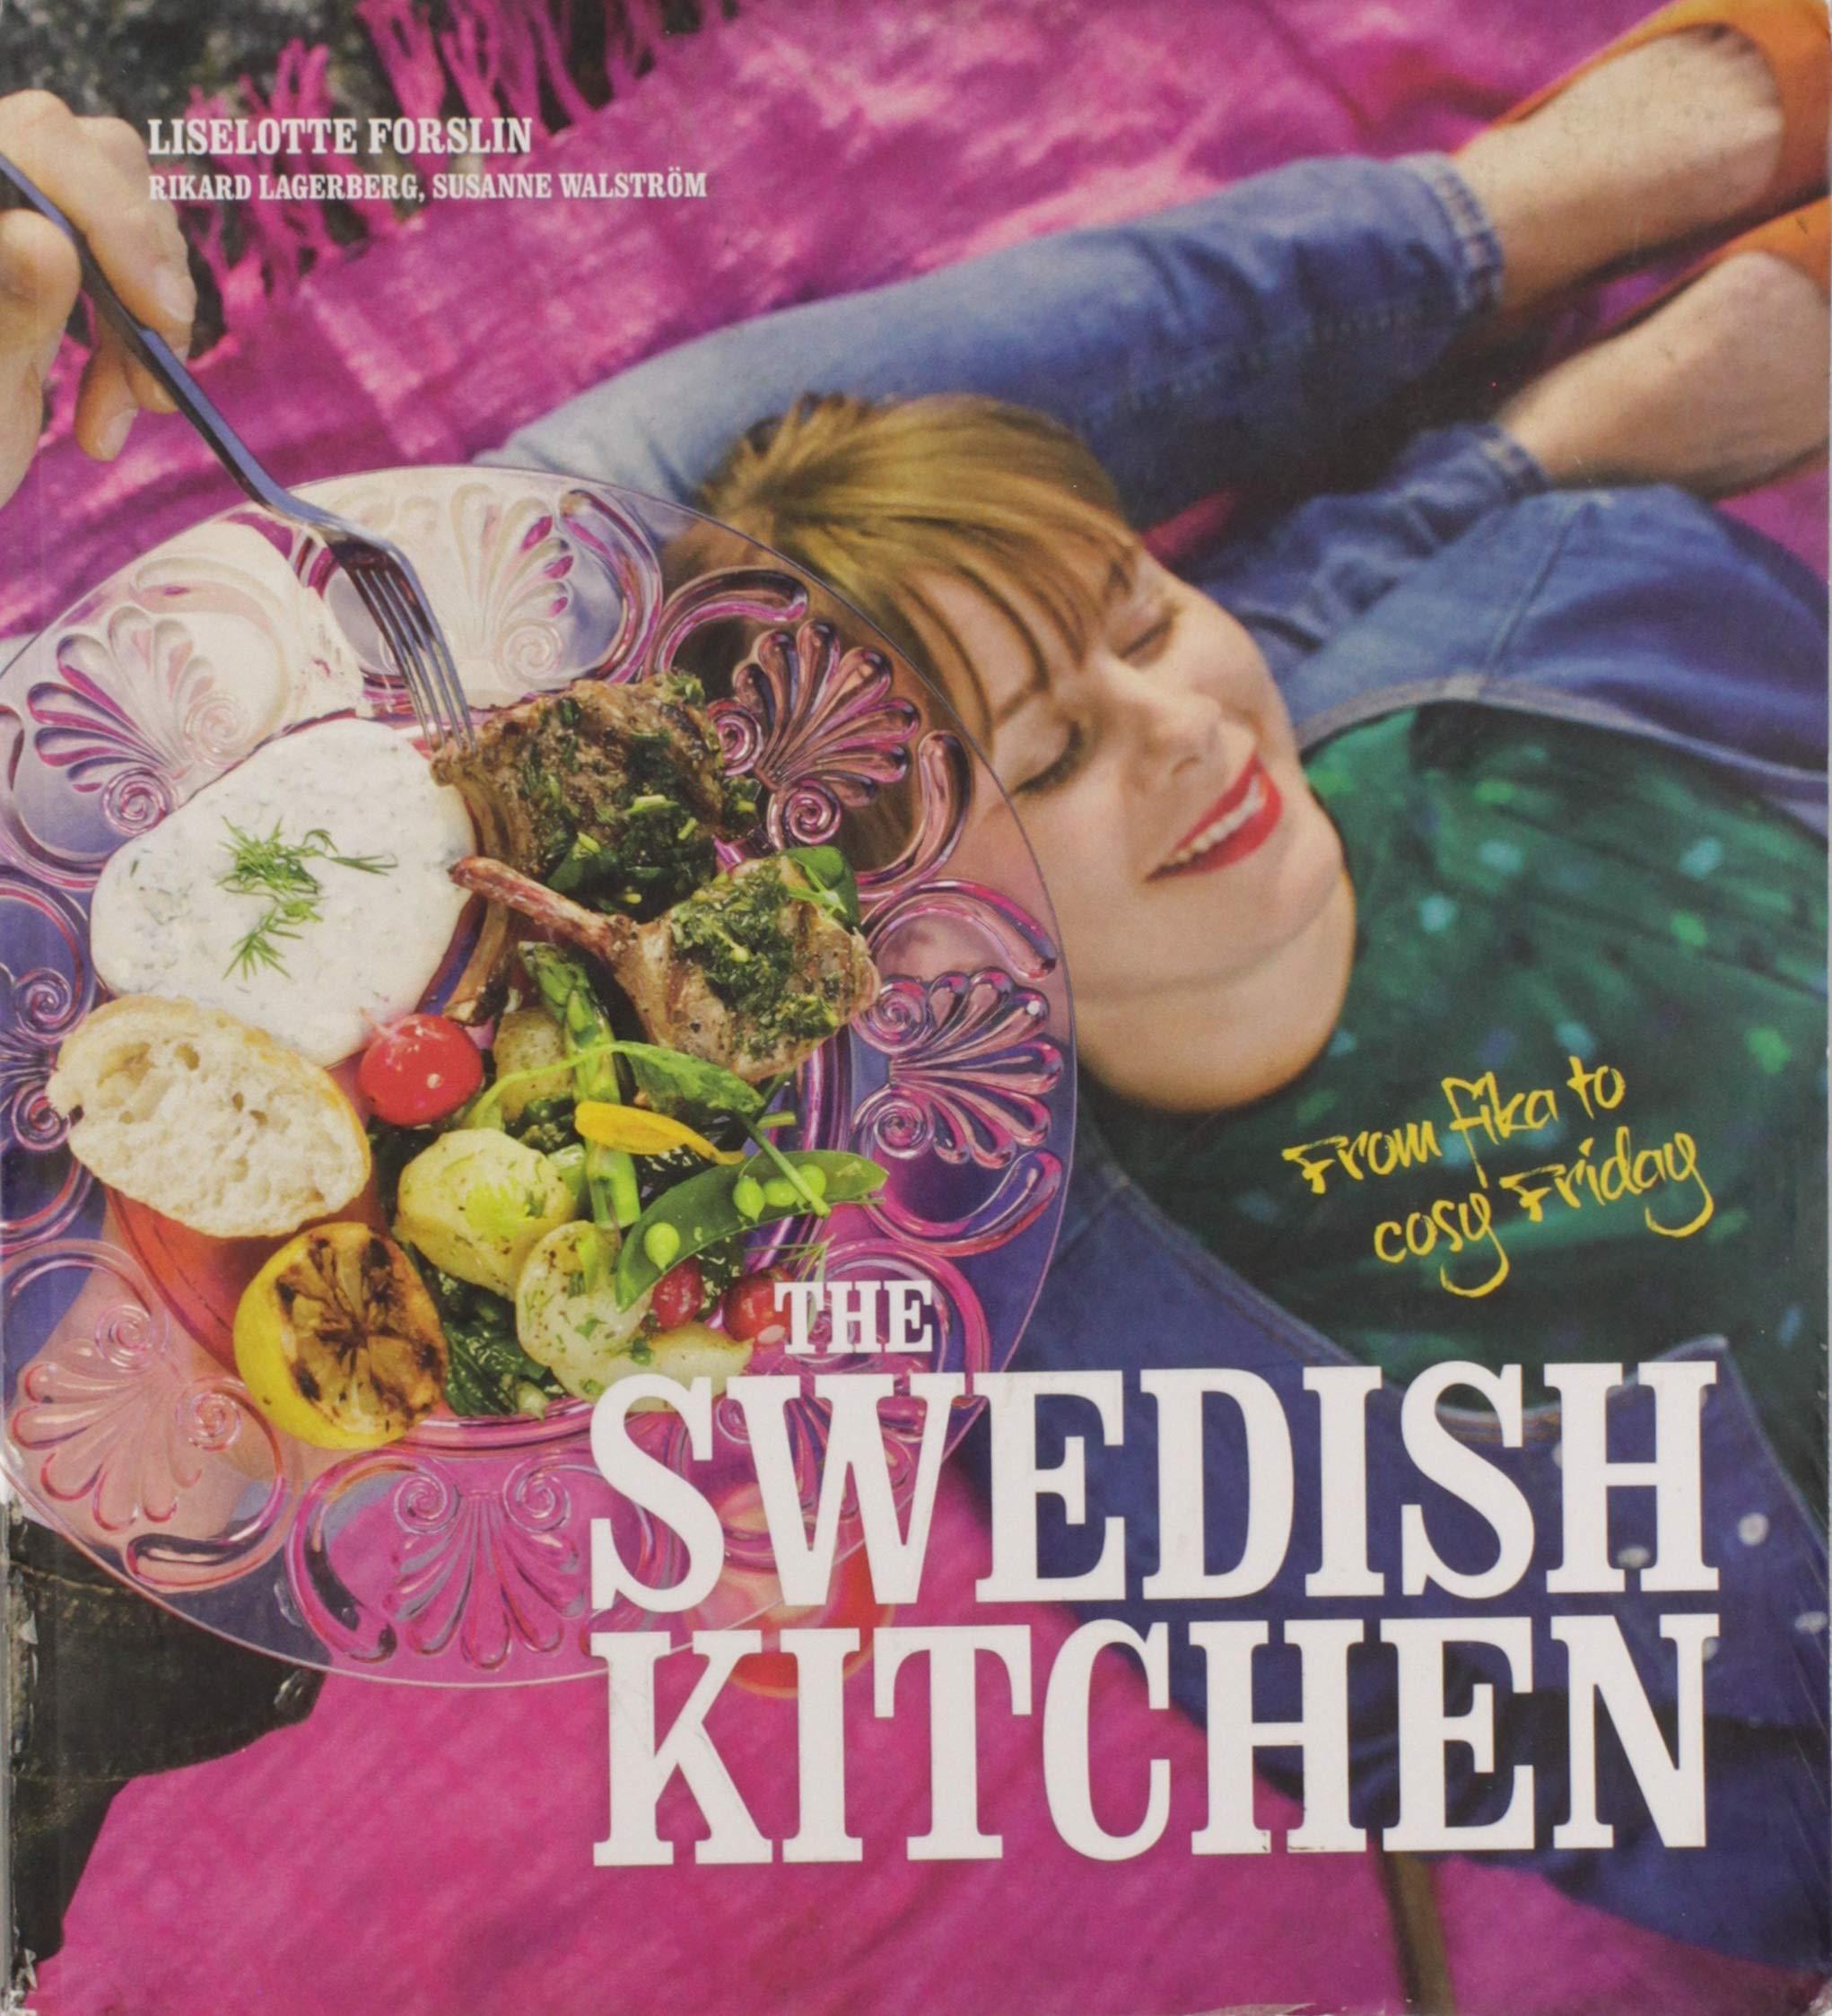 The Swedish Kitchen From Fika To Cosy Friday Amazon De Sigsjo Eva Forslin Liselotte Lagerberg Rikard Stockholm Fidelity Walstrom Susanne Fremdsprachige Bucher